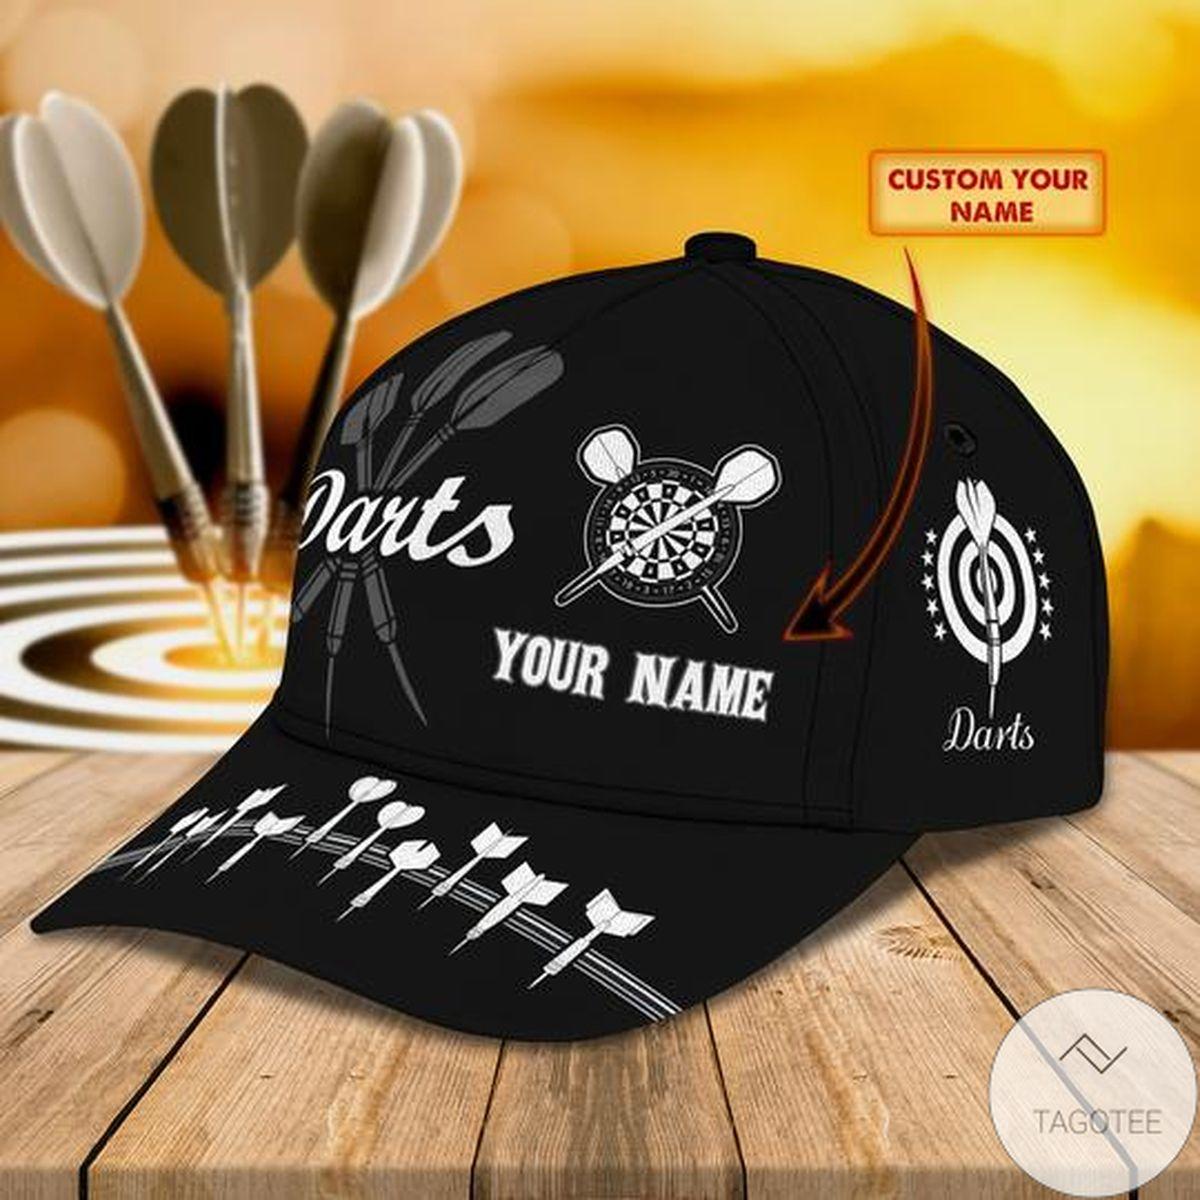 Personalized Darts Black Cap